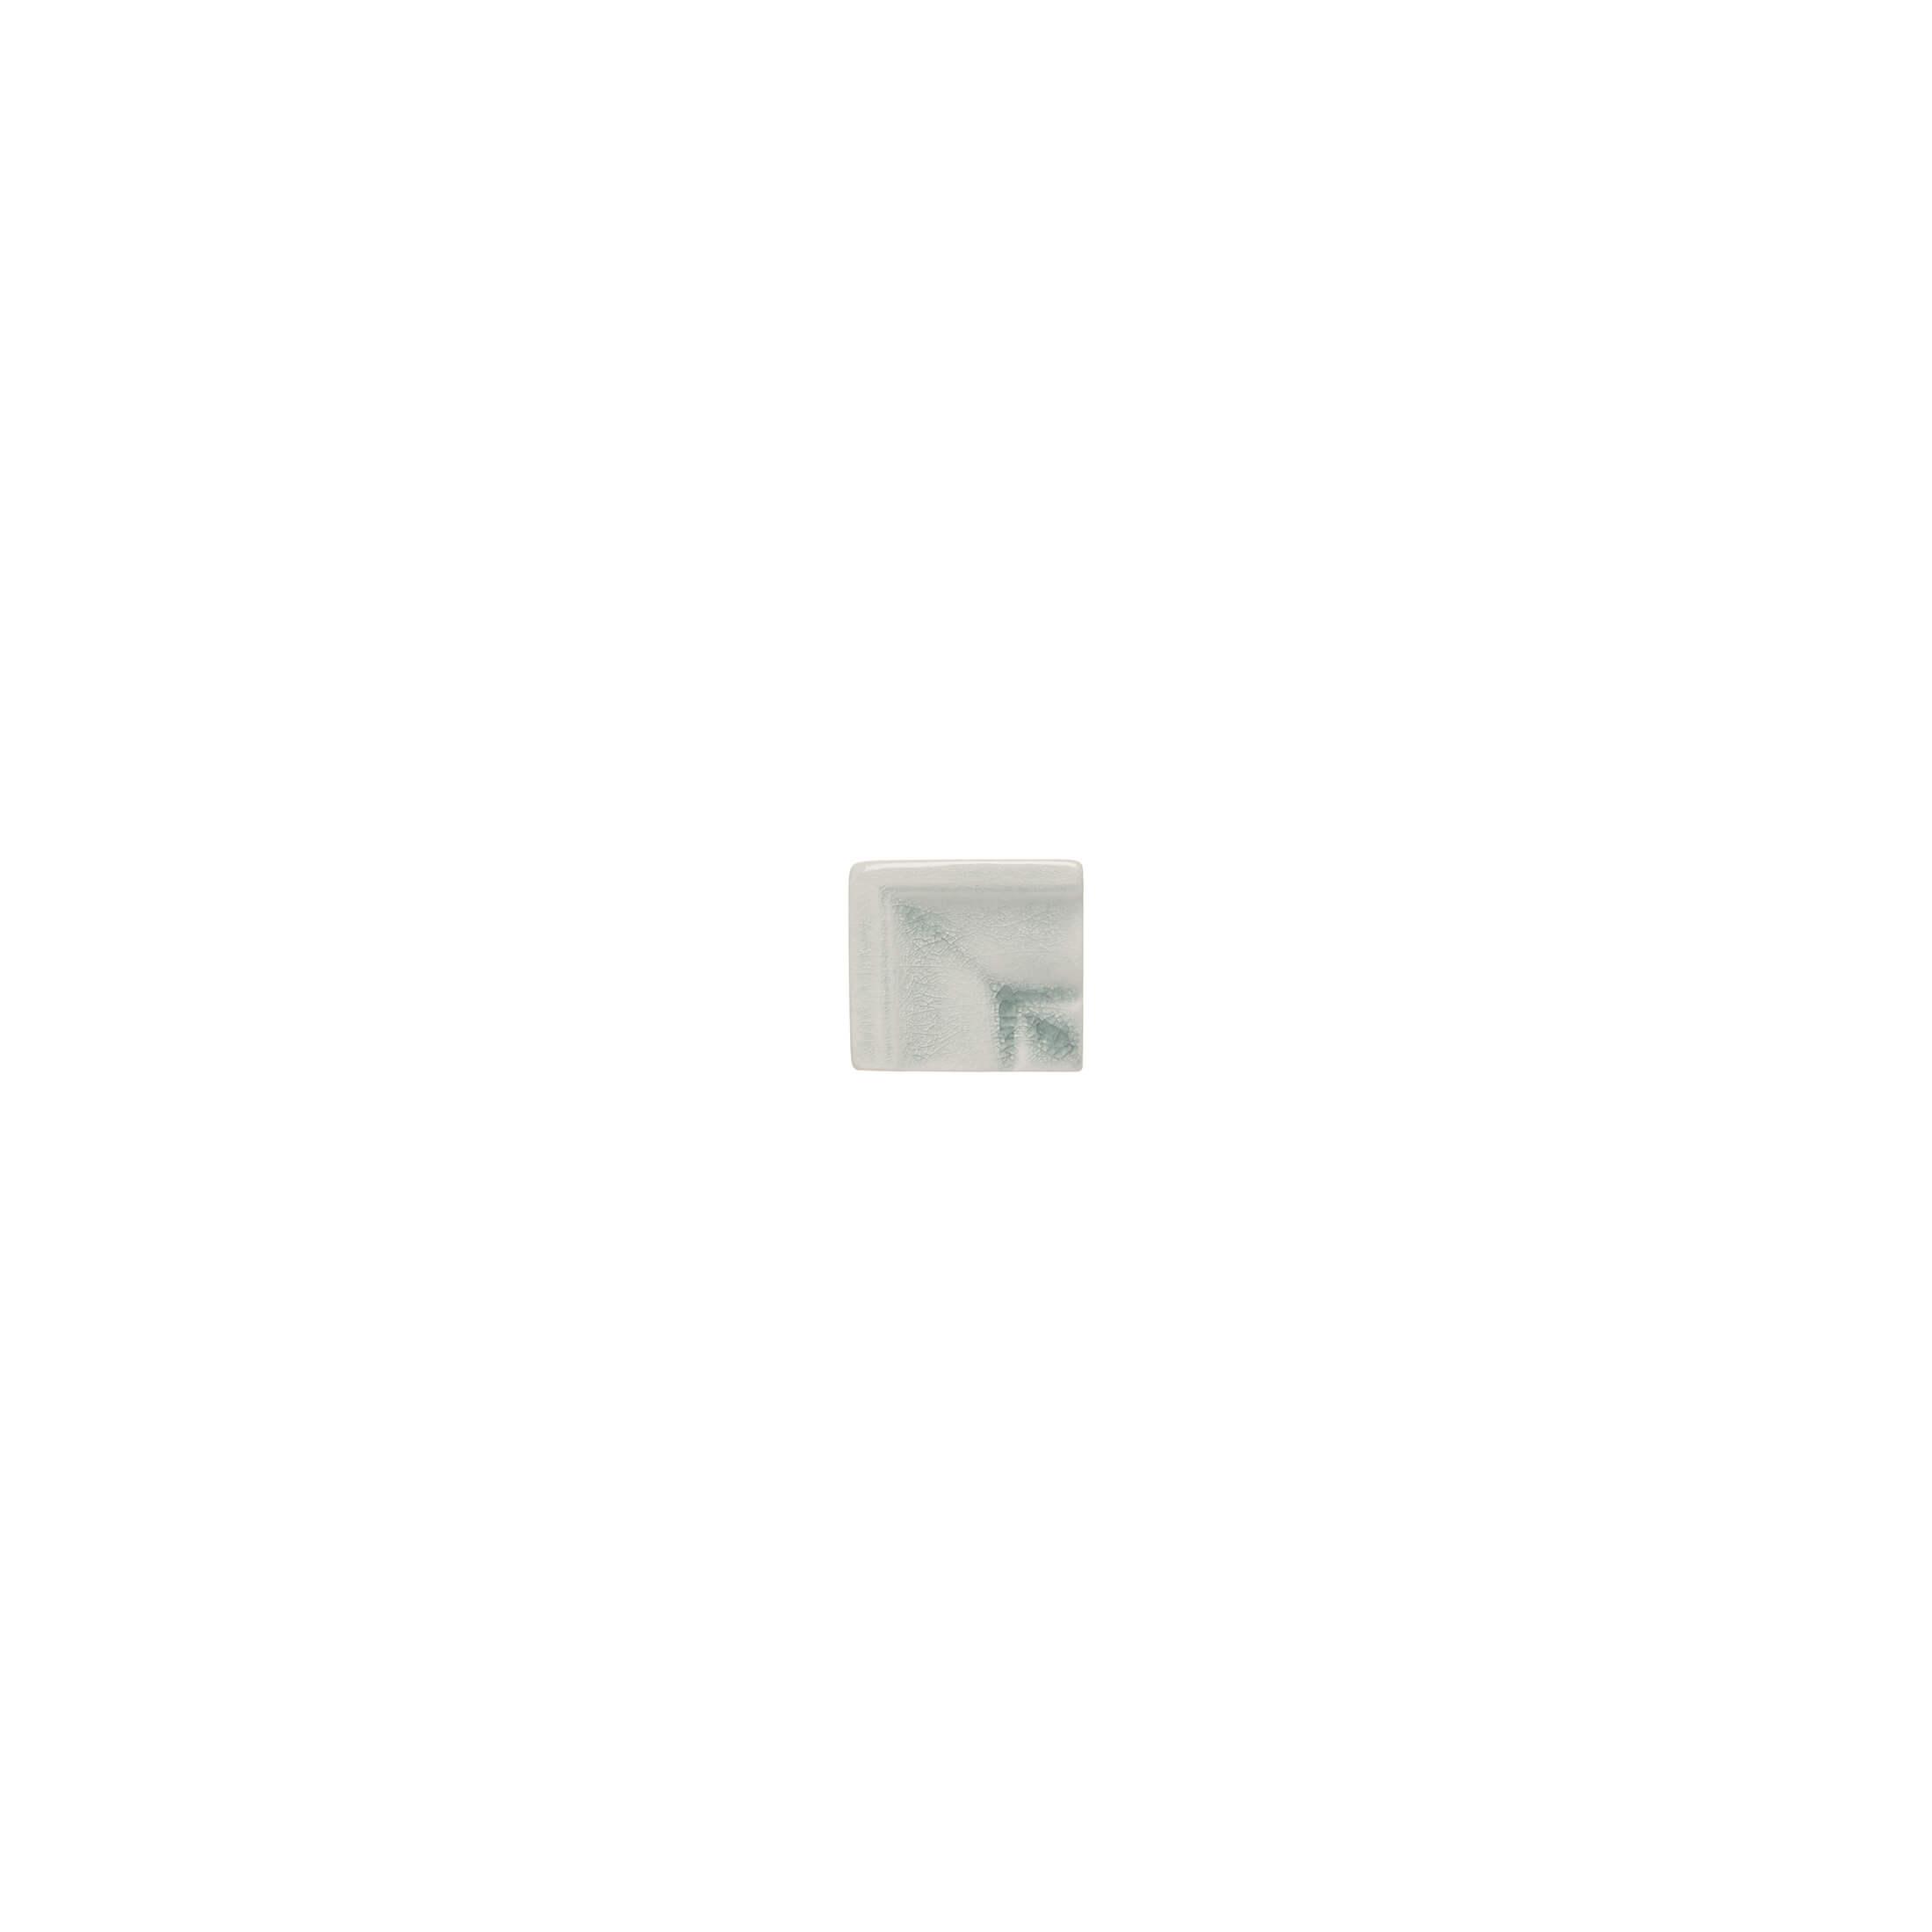 ADOC5074 - ANGULO MARCOCORNISA - 3 cm X 15 cm